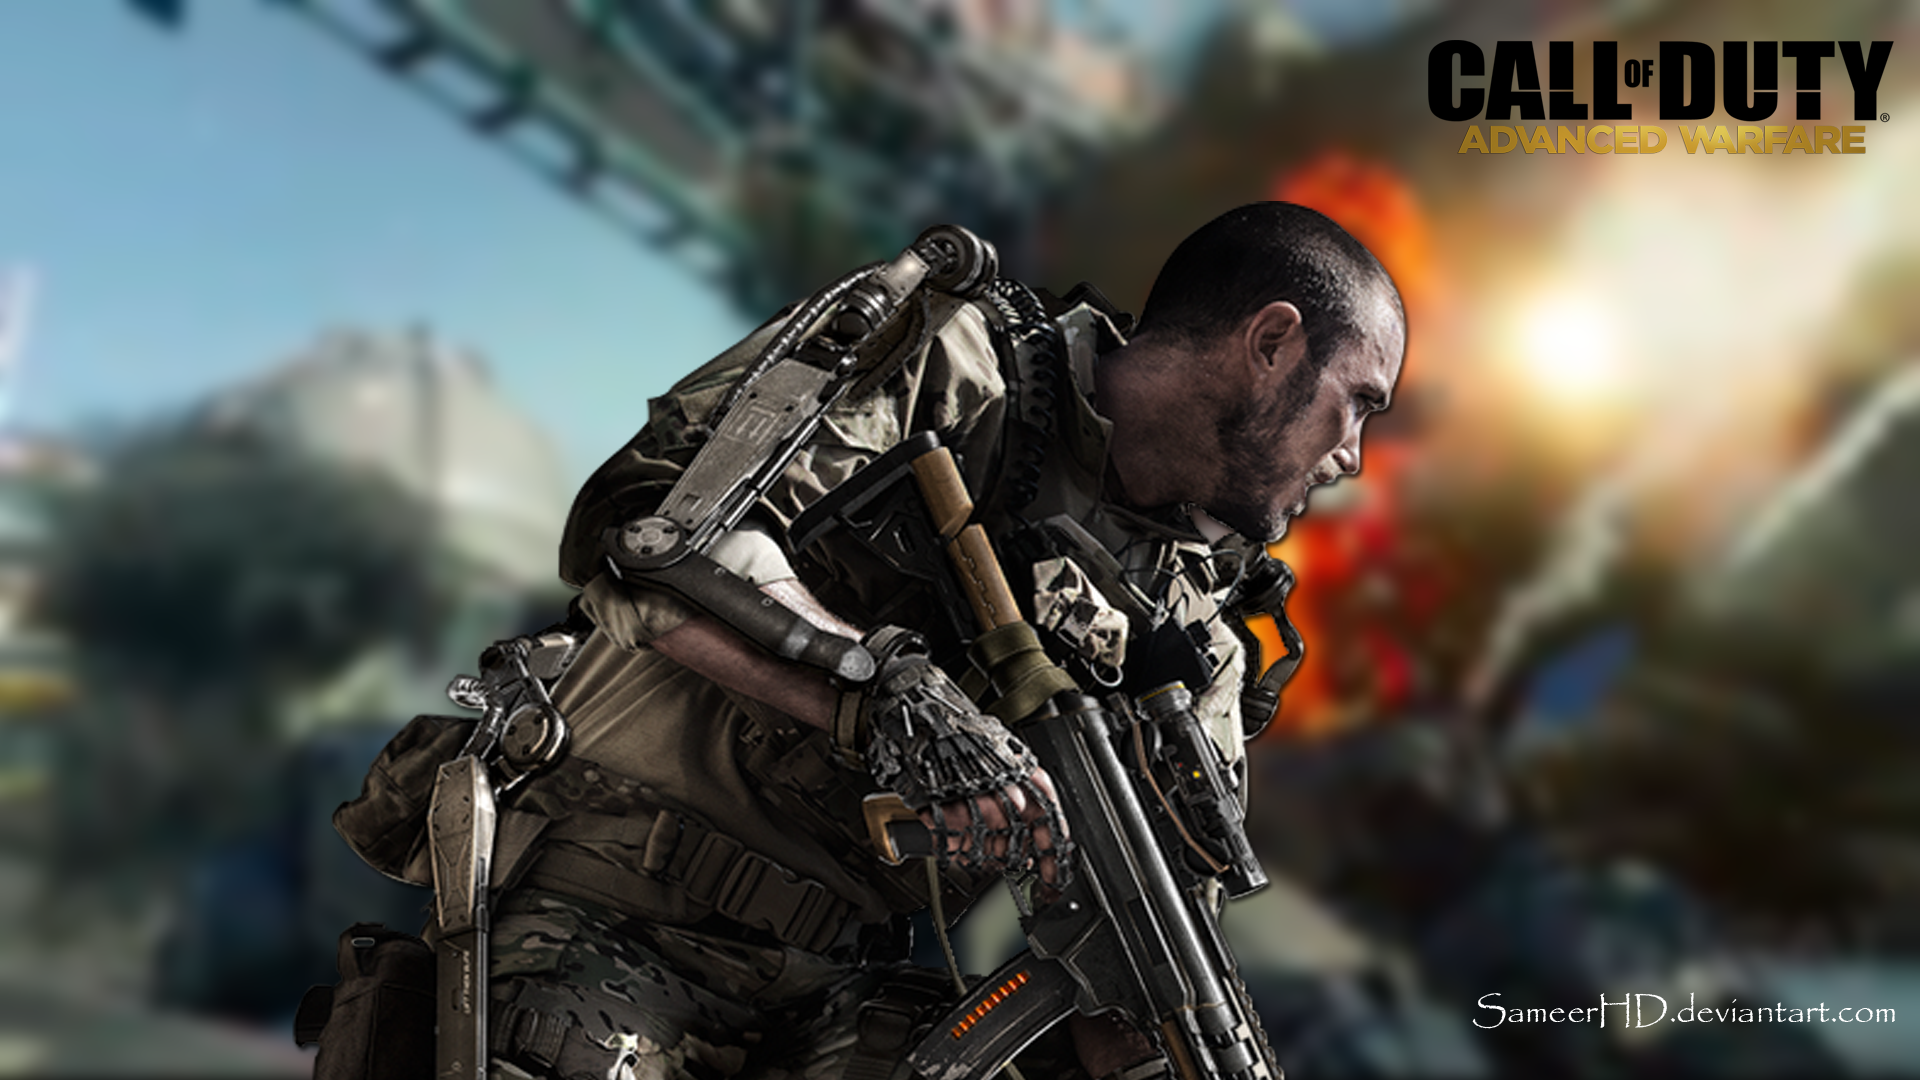 IPhone S C Call Of Duty Advanced Warfare Wallpapers HD